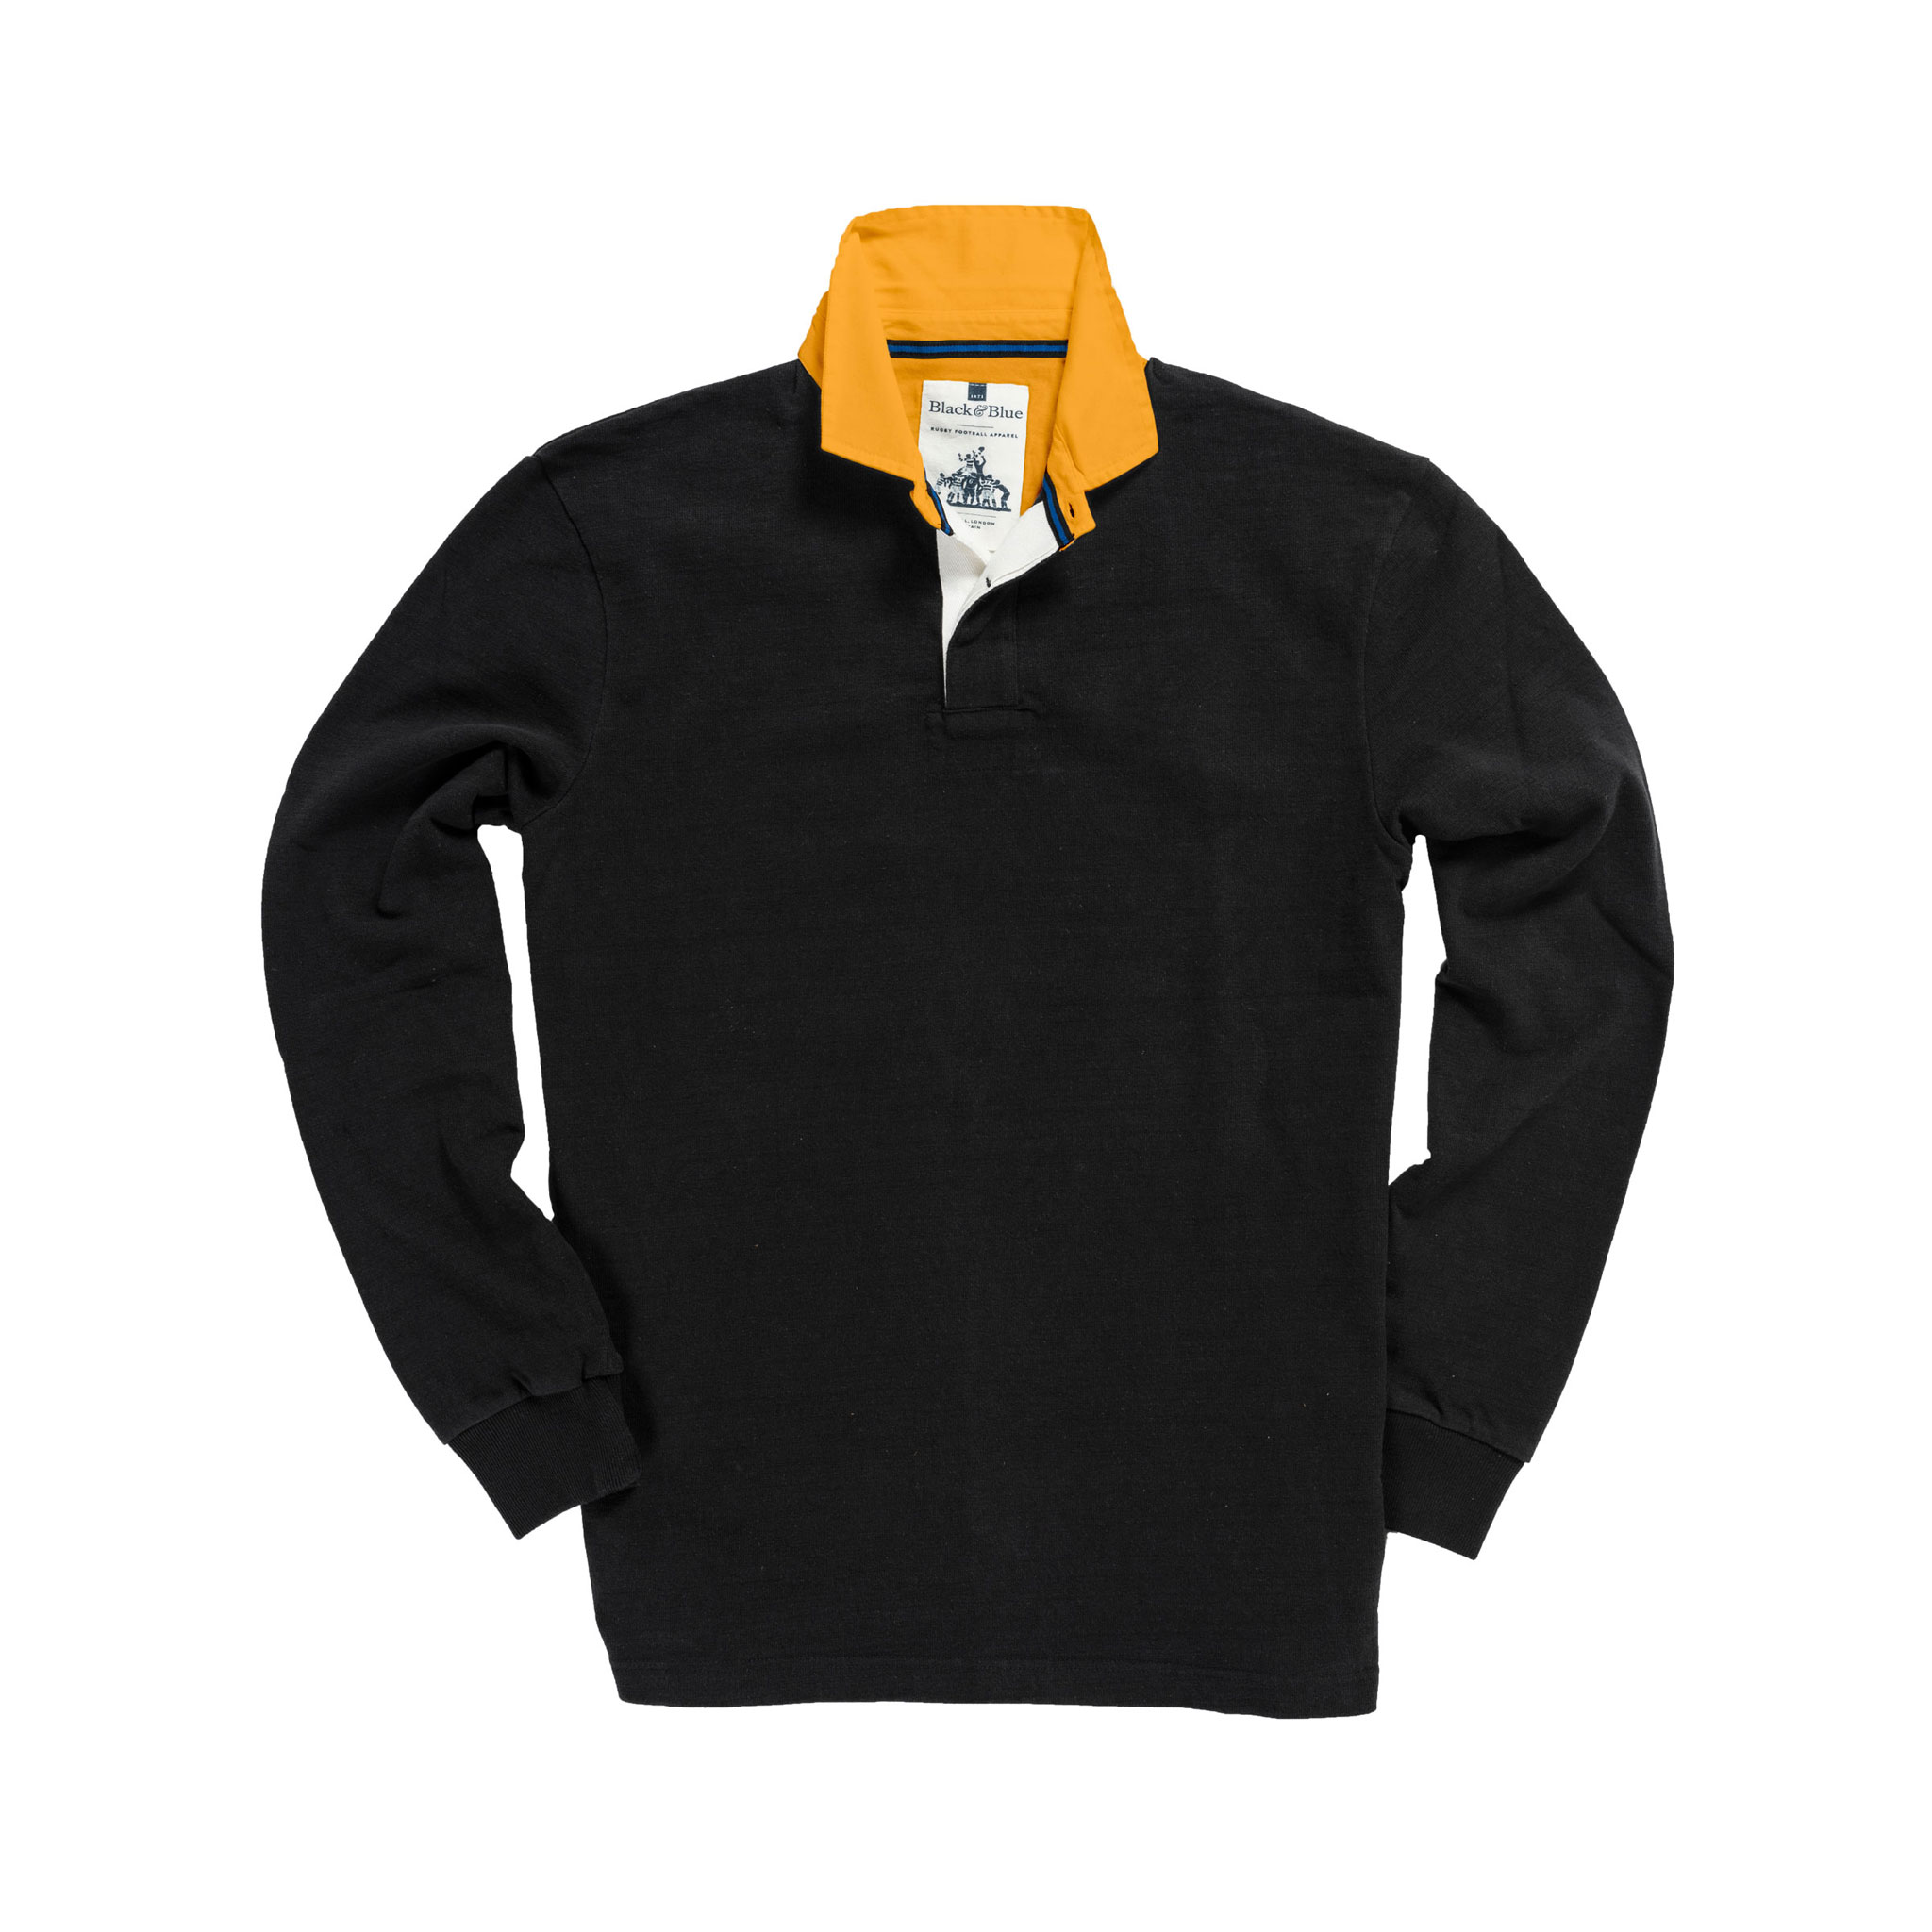 Gold Collar 1871 Rugby Shirt